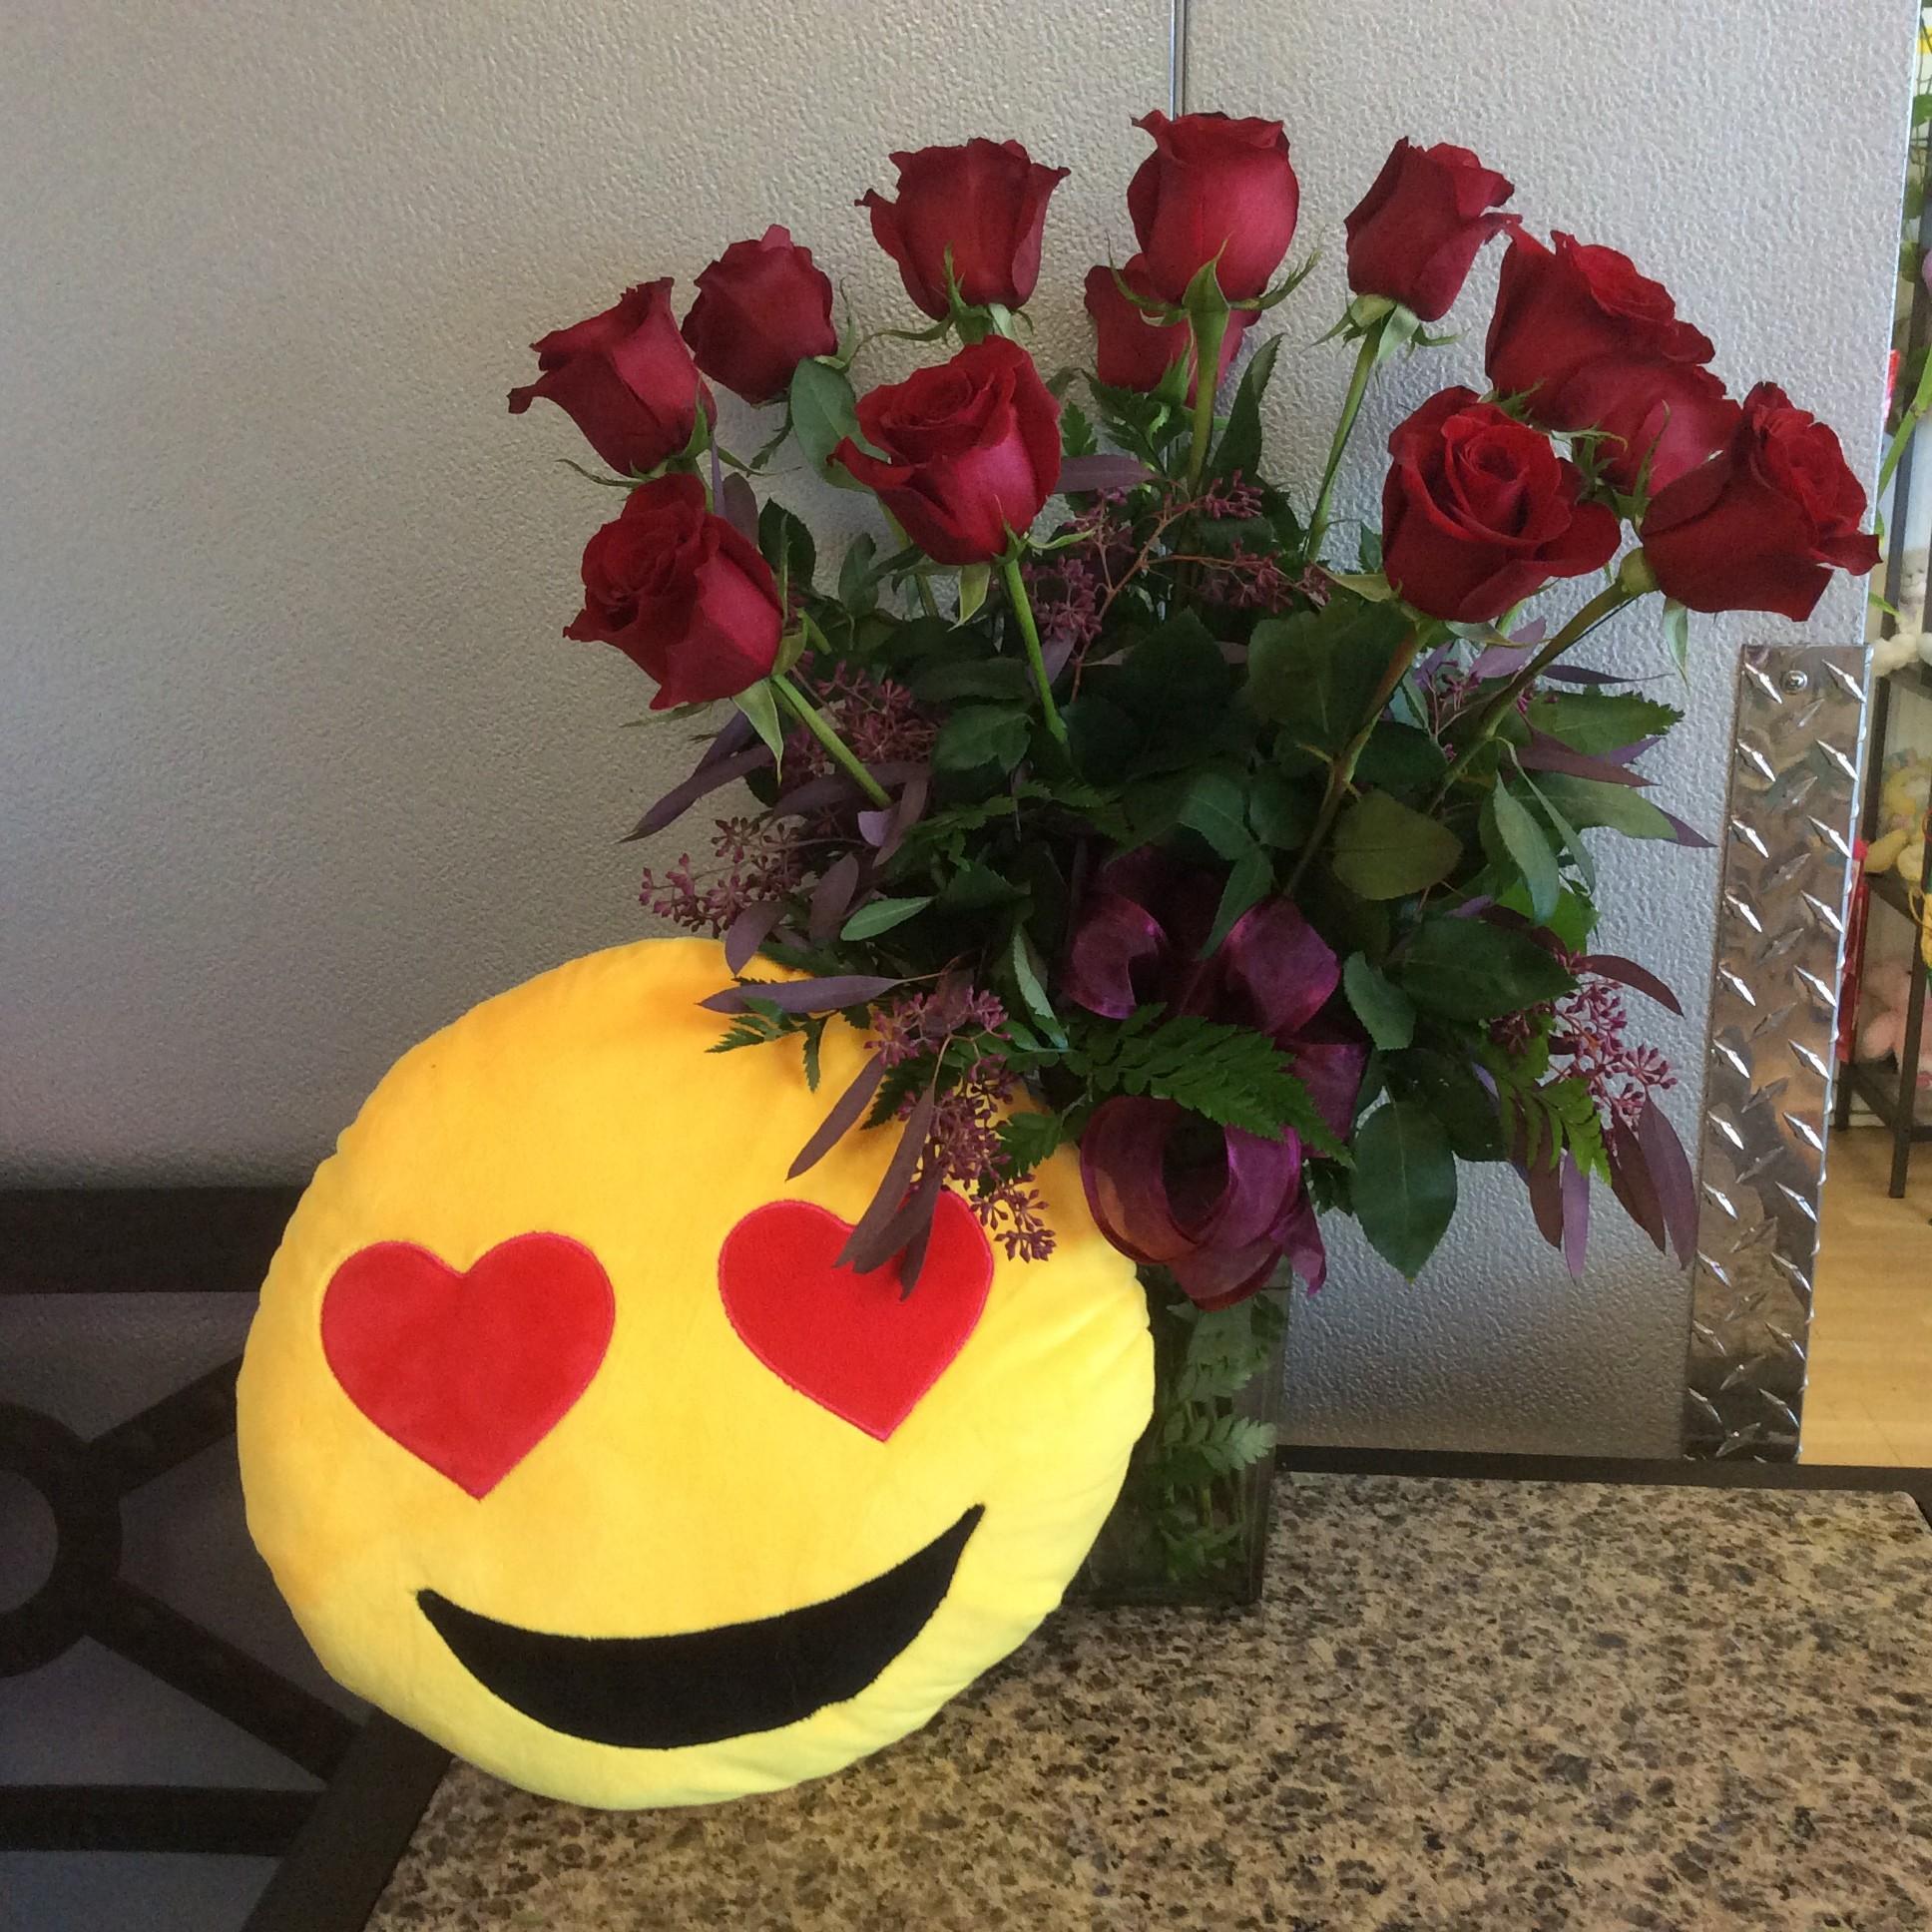 Dz. Red Roses & Heart Eyes Emoji Pillow in Tempe, AZ | Campus Flowers